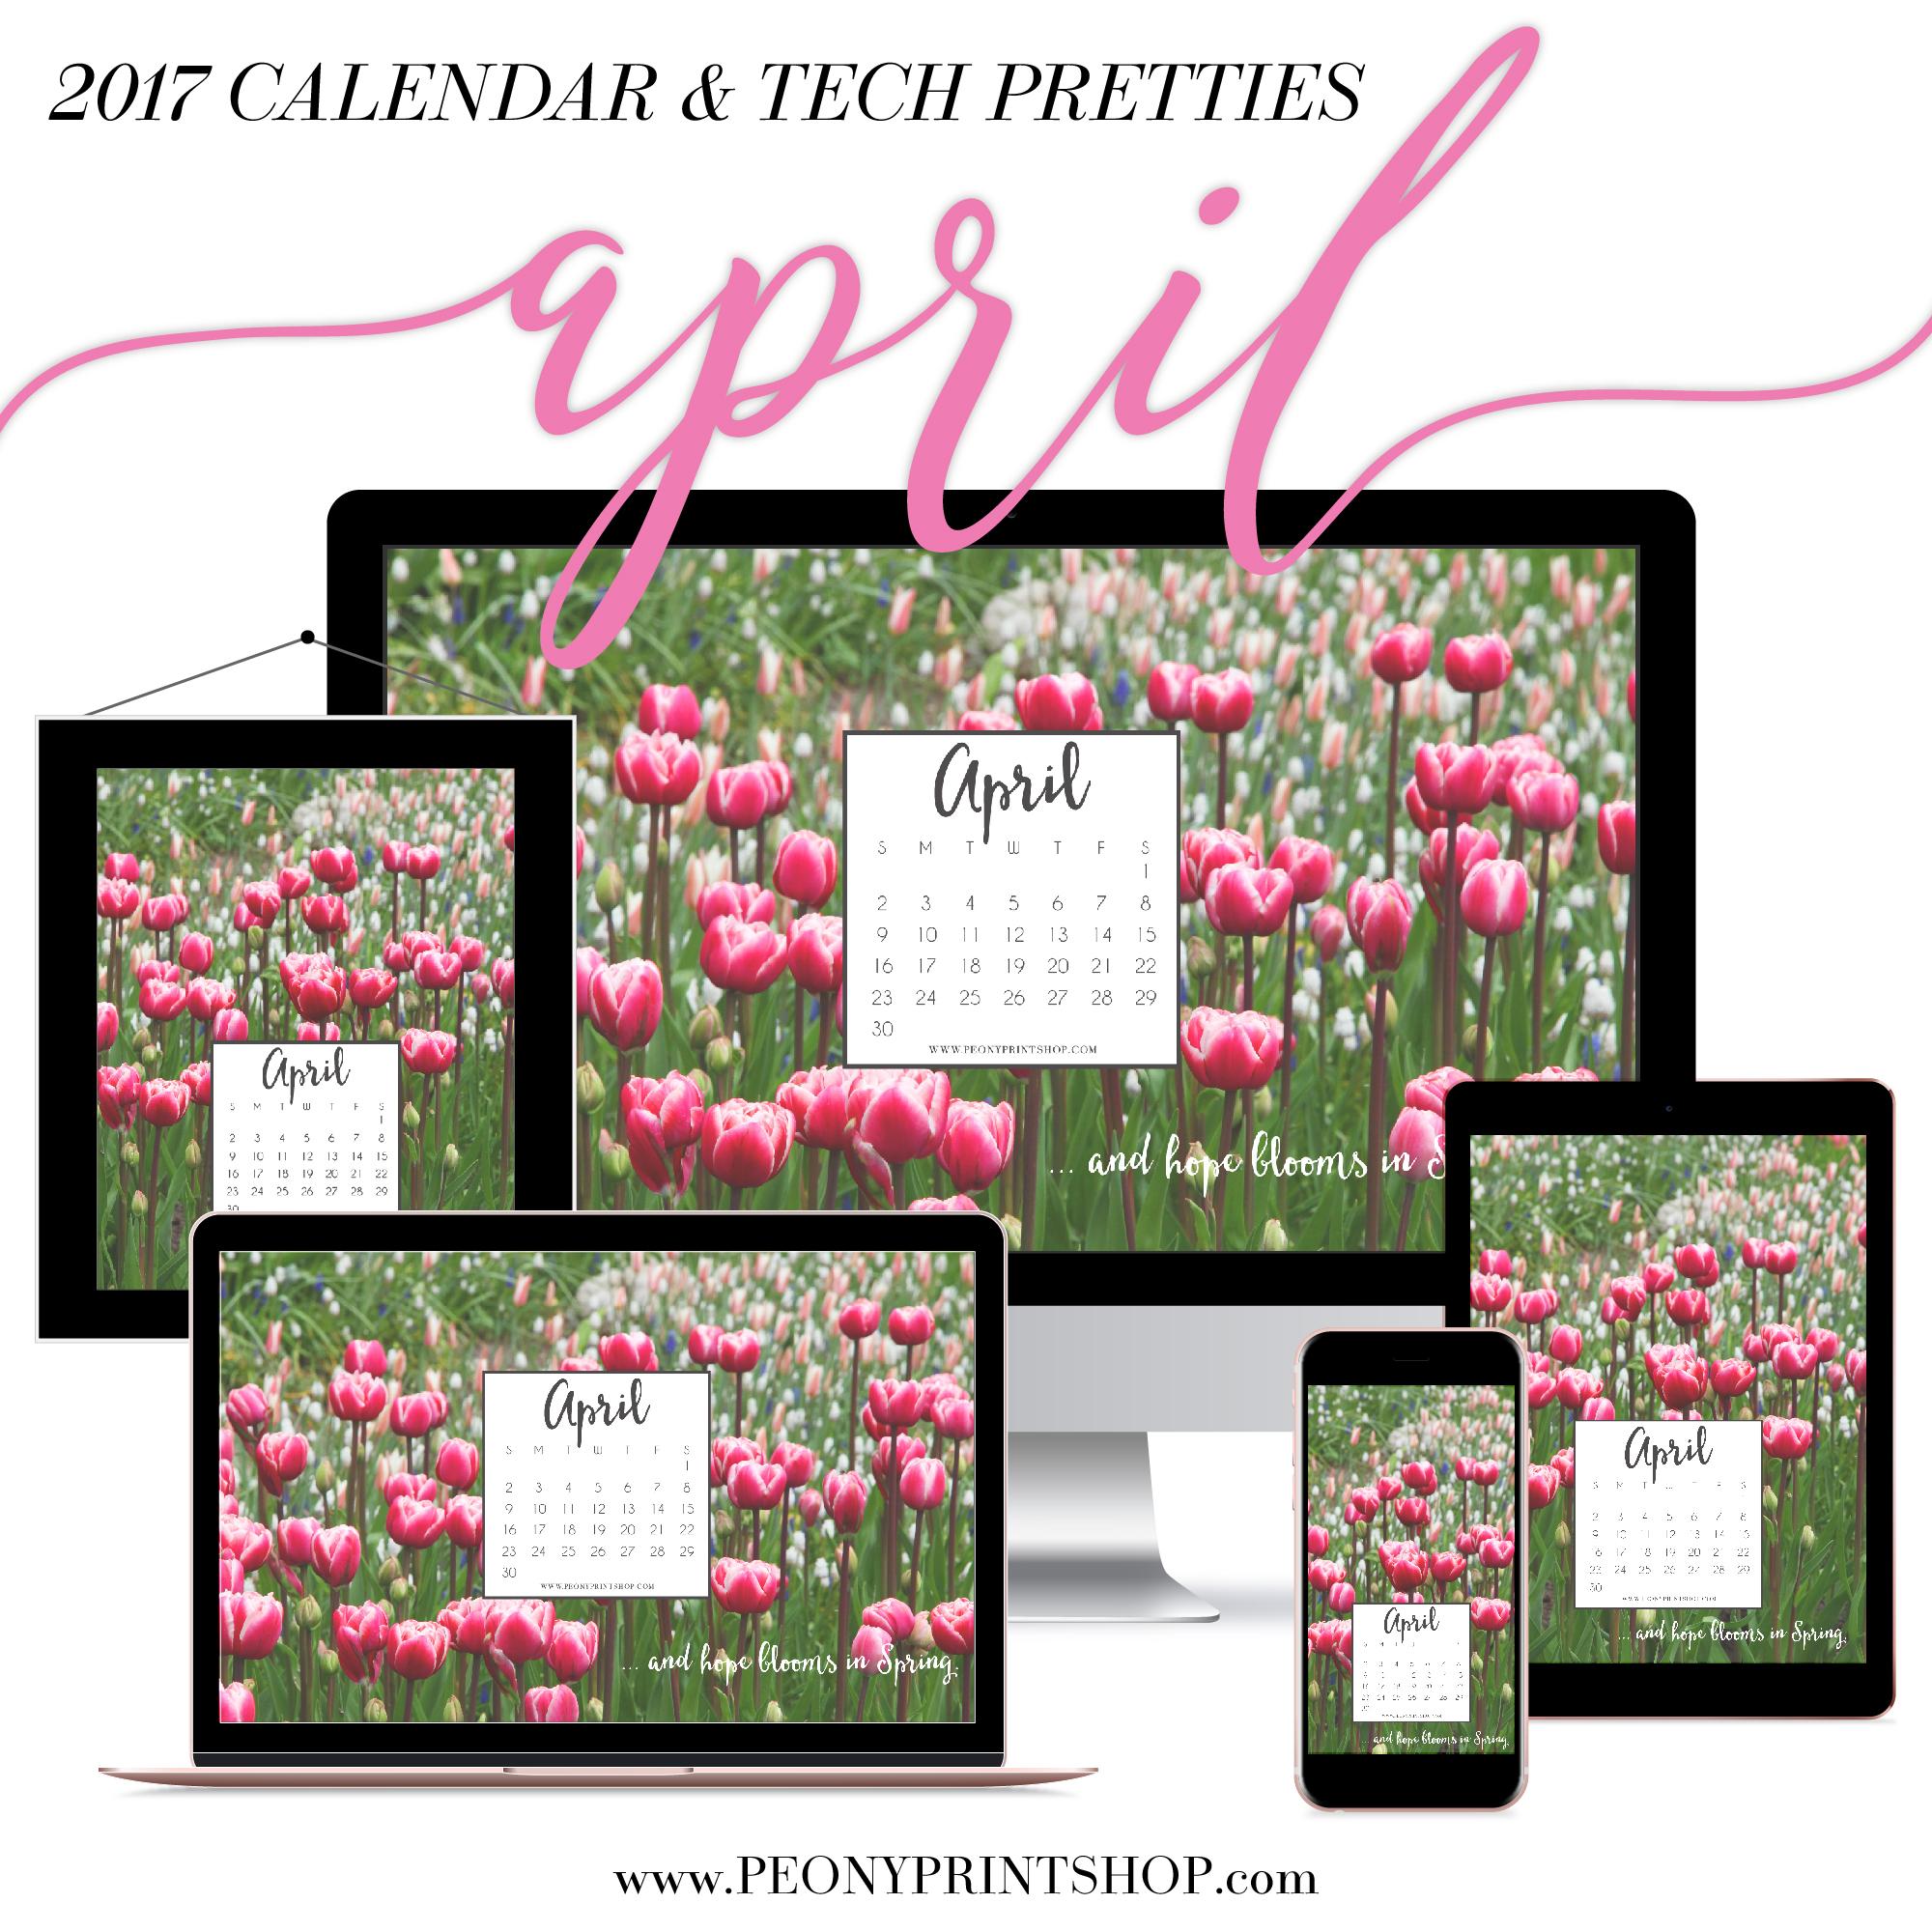 2017 April Calendar + Tech Pretties  |  PeonyPrintshop.com